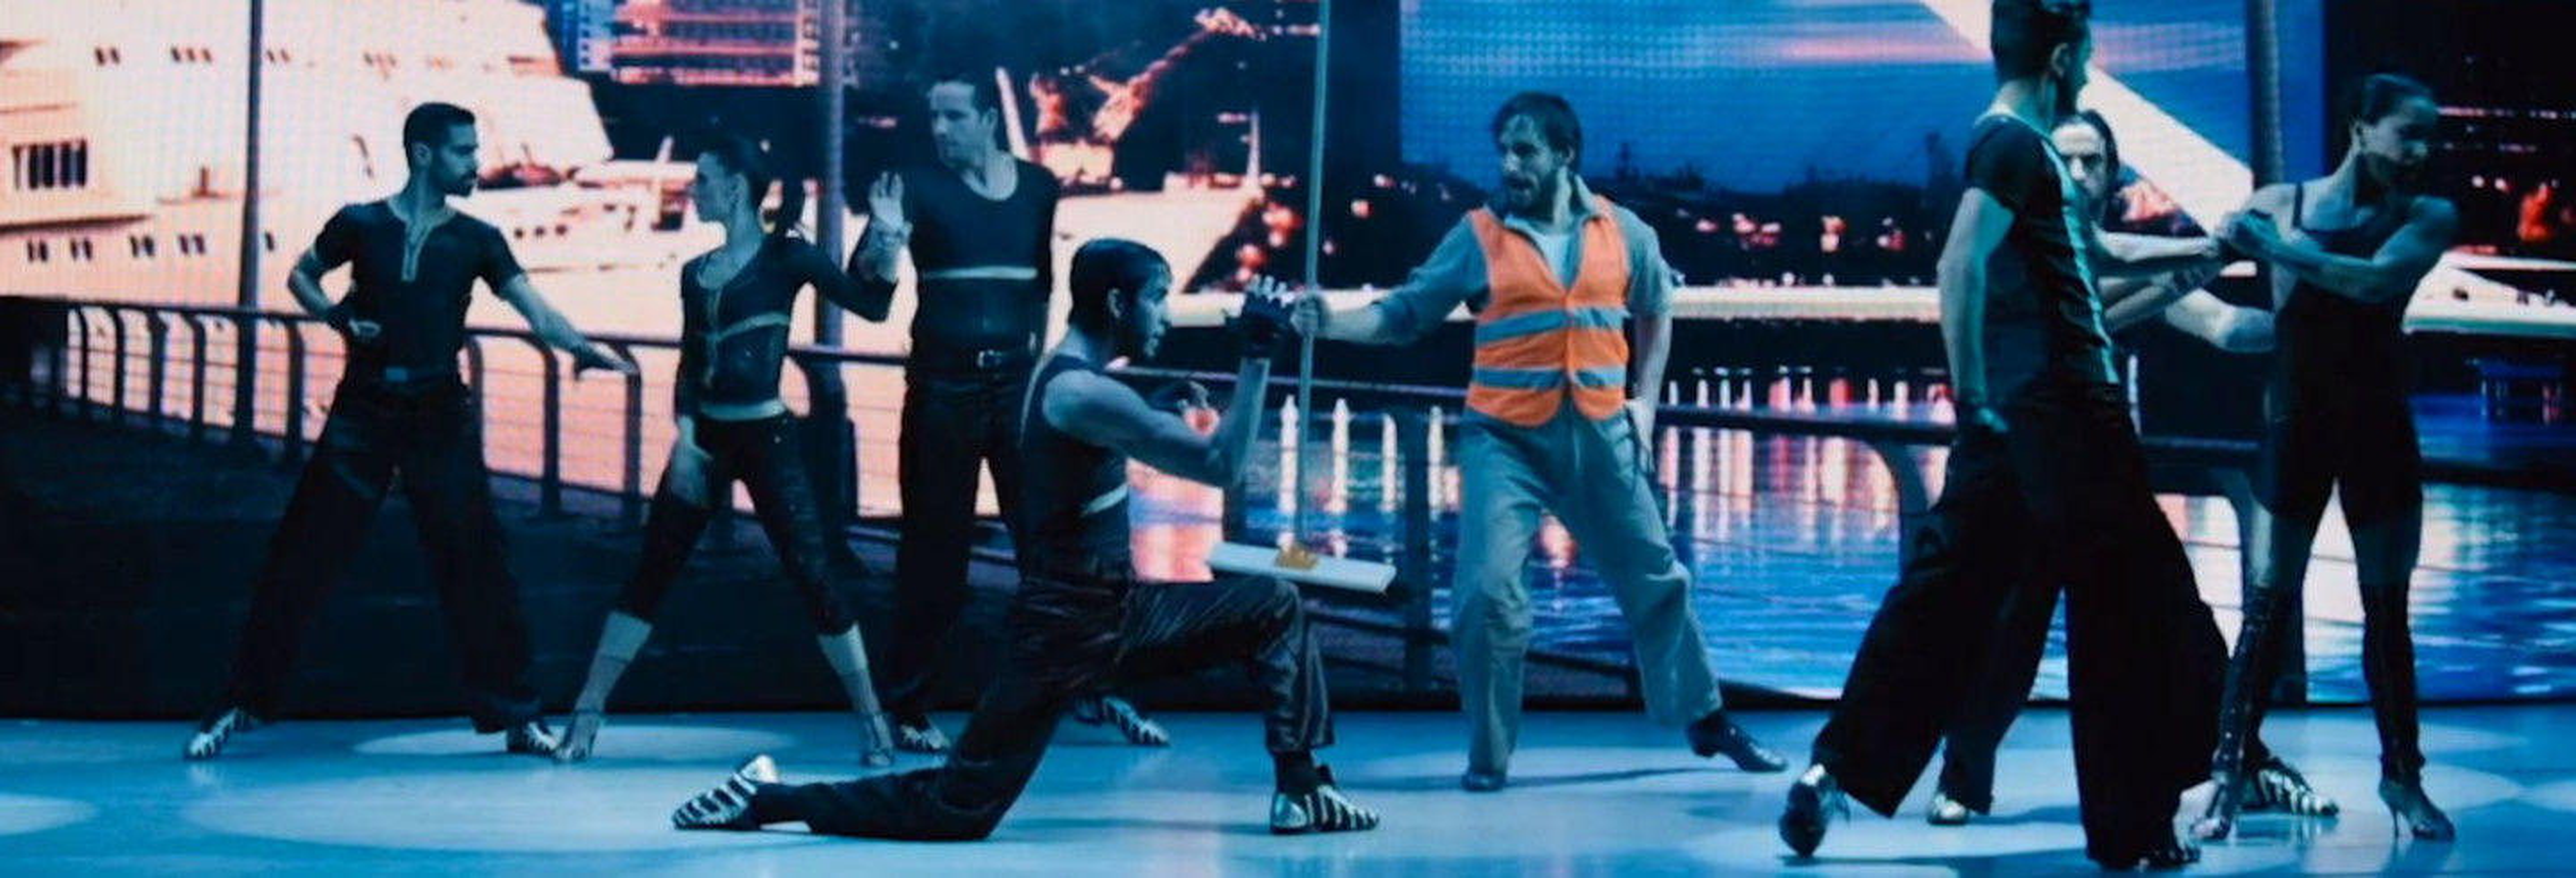 Espetáculo no Madero Tango